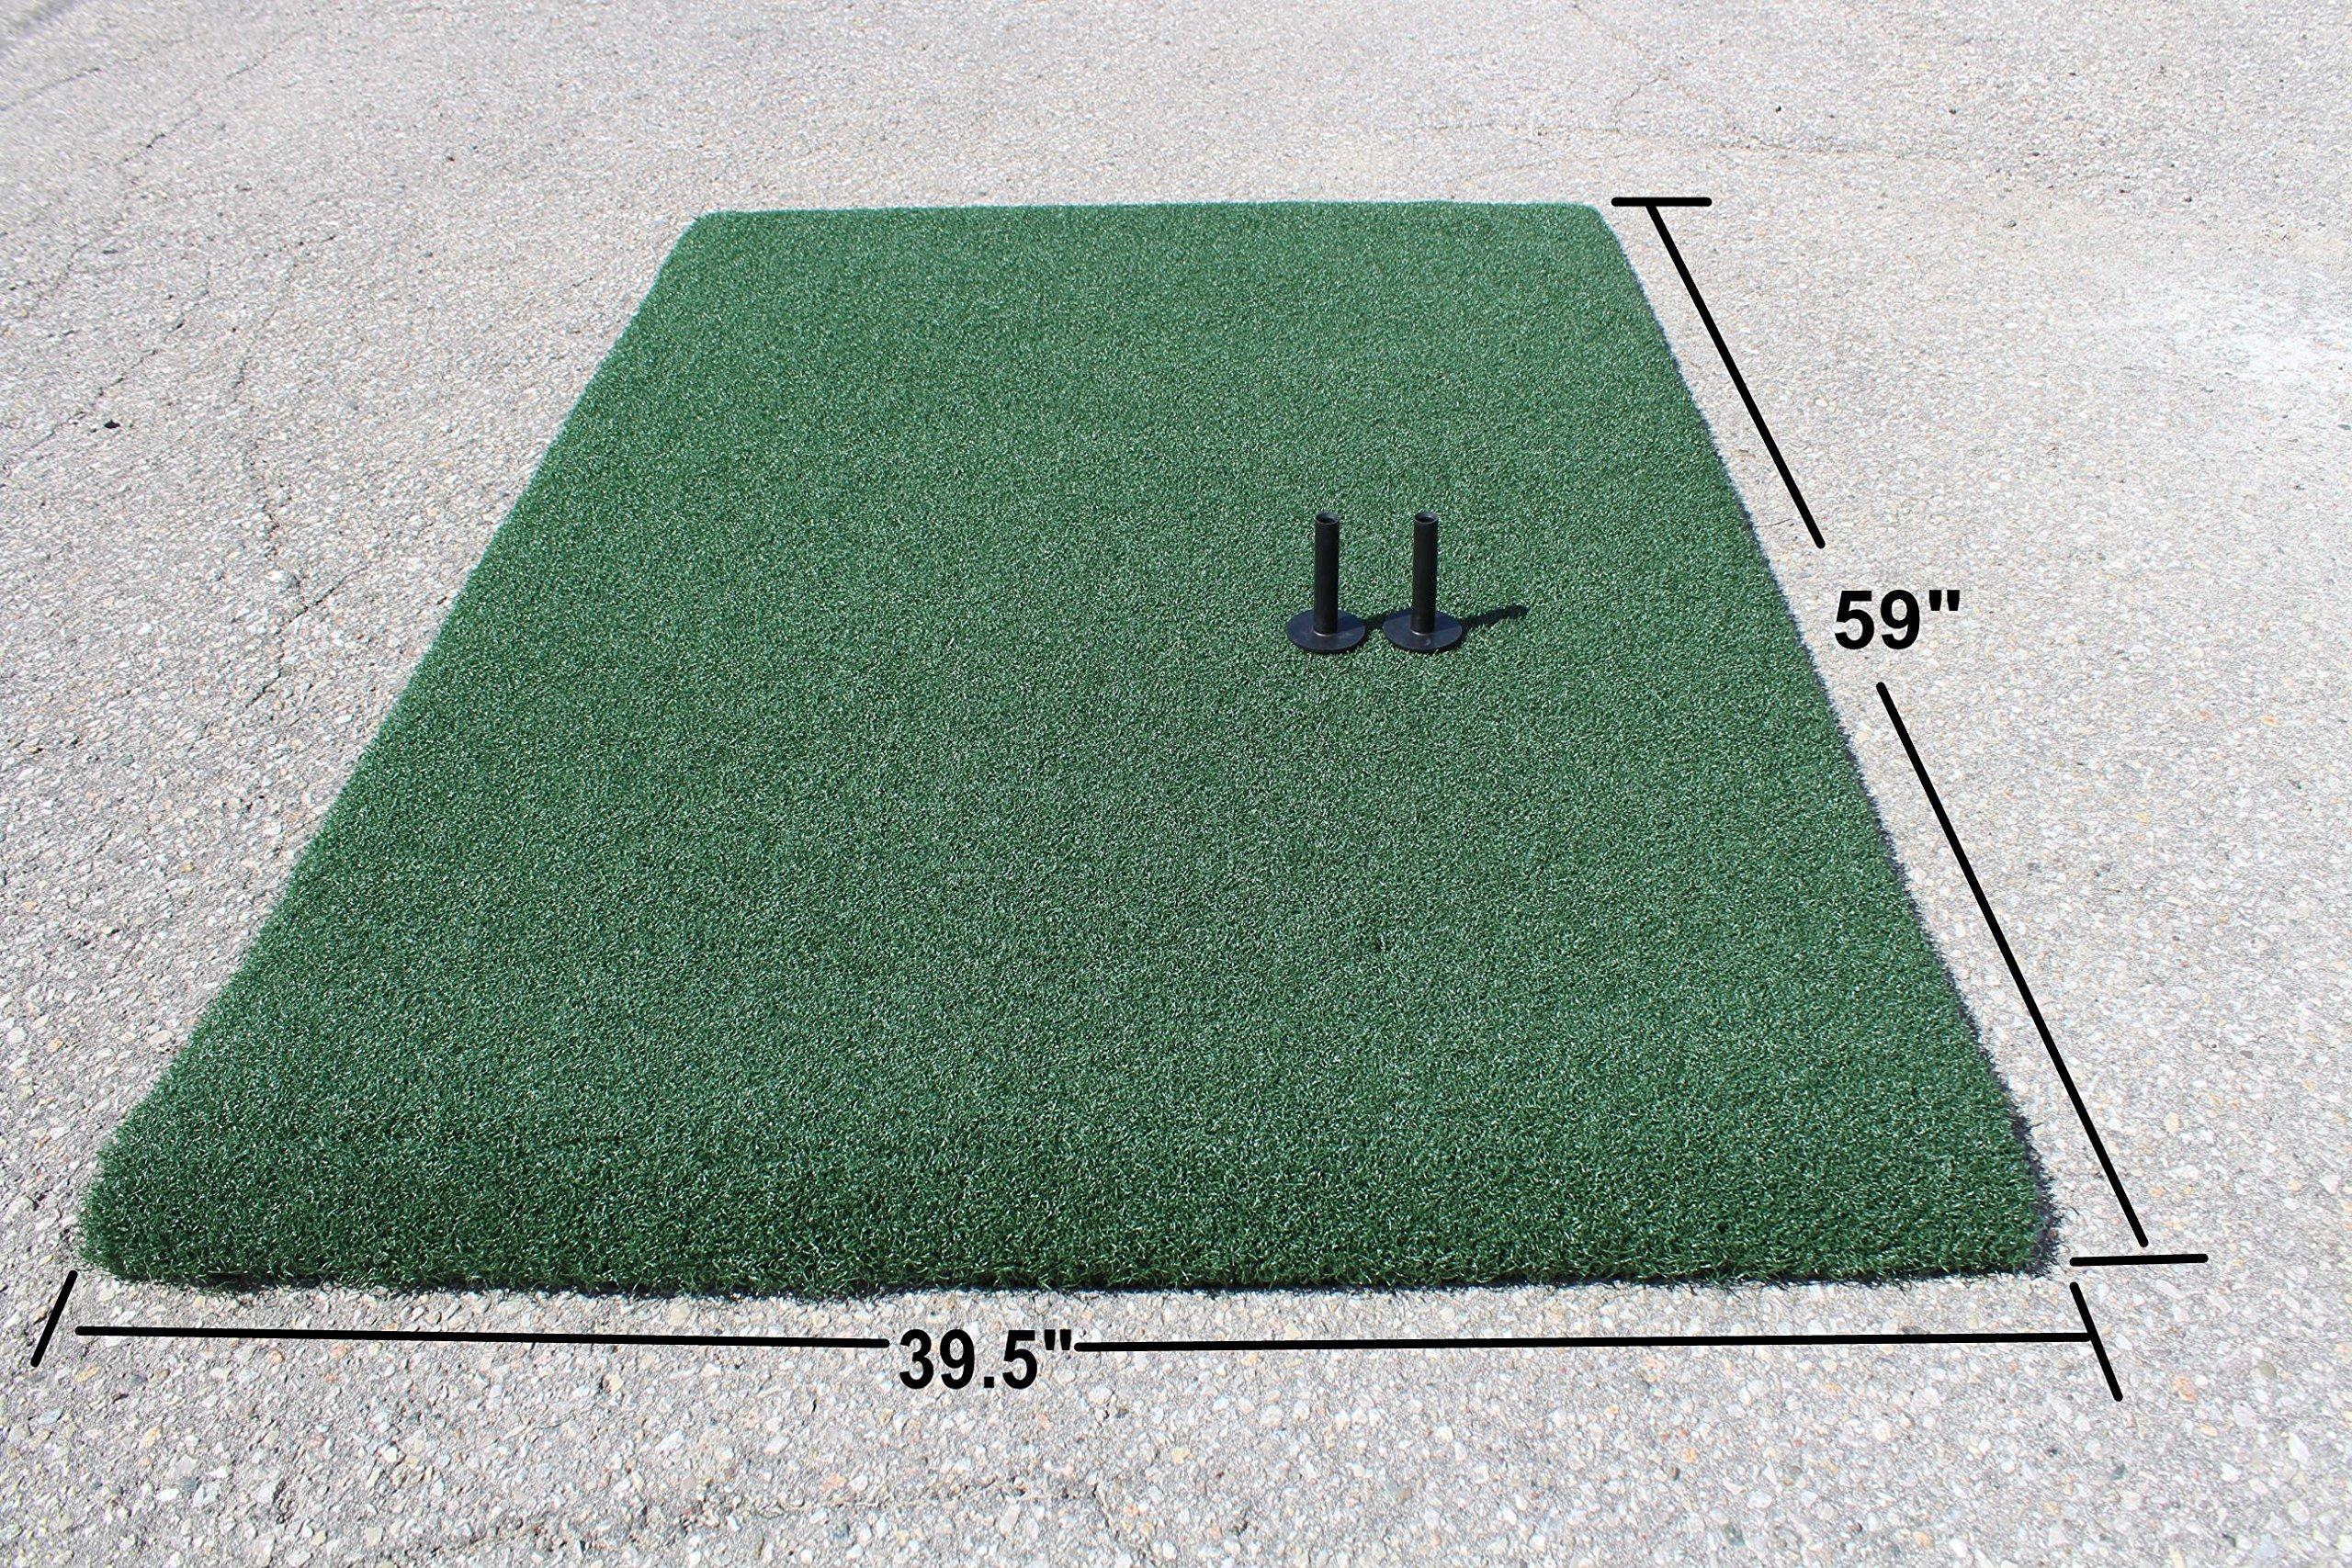 Golf Range True Feel Super Thick mat Golf Chipping Driving Practice Mat 59 x 39 1/2 x1 1/4'' by A99 Golf (Image #4)